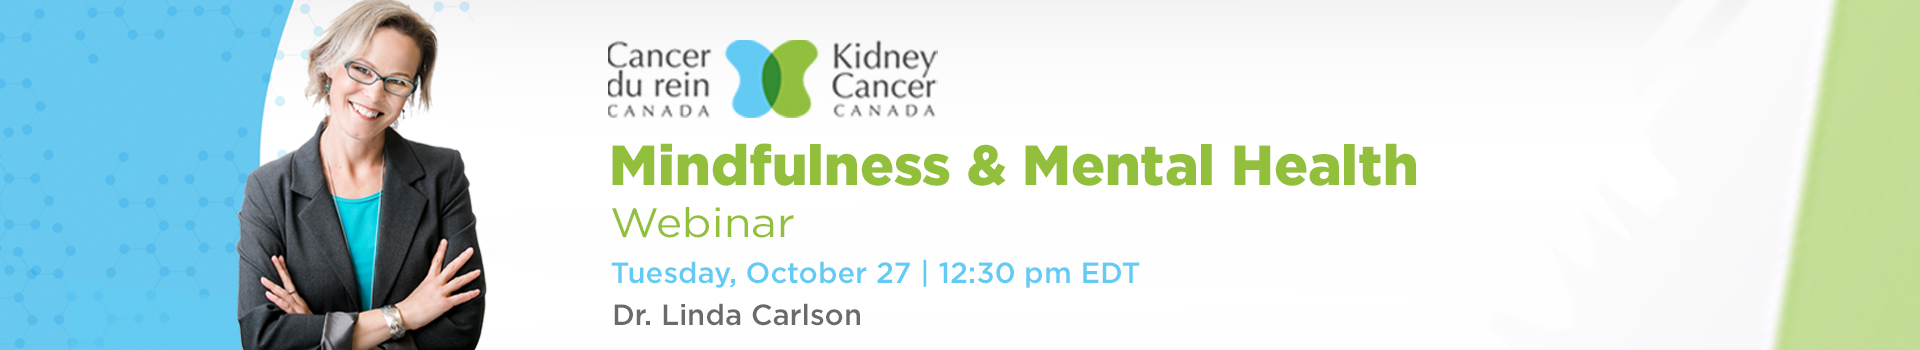 Dr. Linda Carlson - Kidney Cancer Canada Webinar Mindfulness & Mental Health